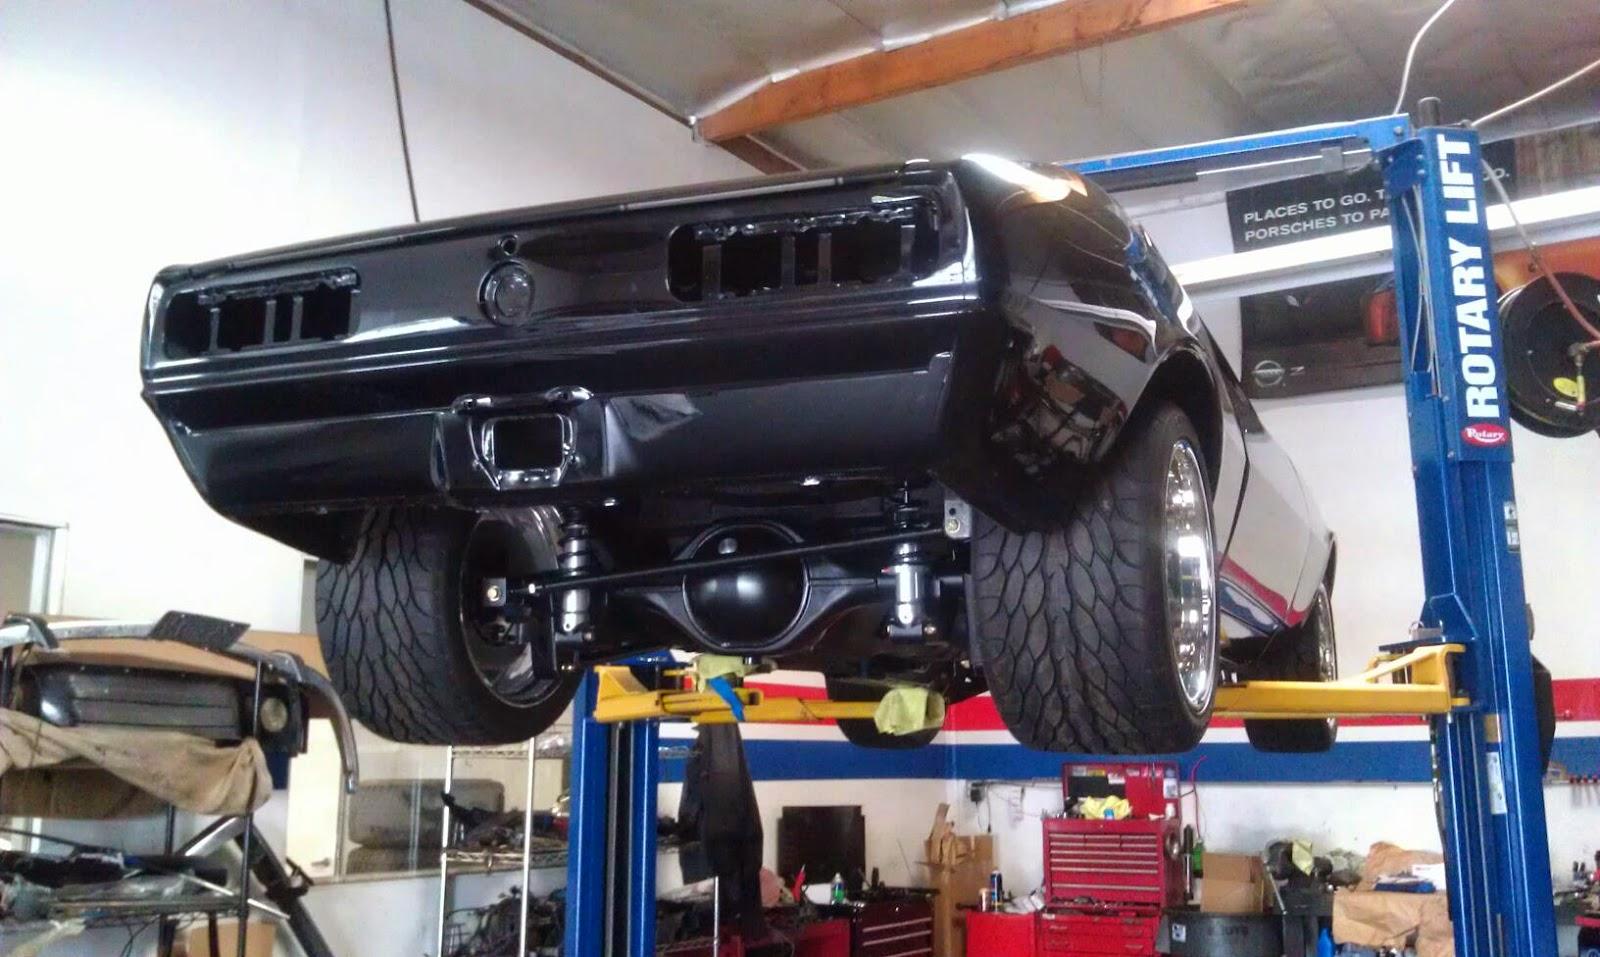 1967 Camaro Parts Steve39s Camaro Parts 1967 1969 Camaro Parts Enrique39s 1967